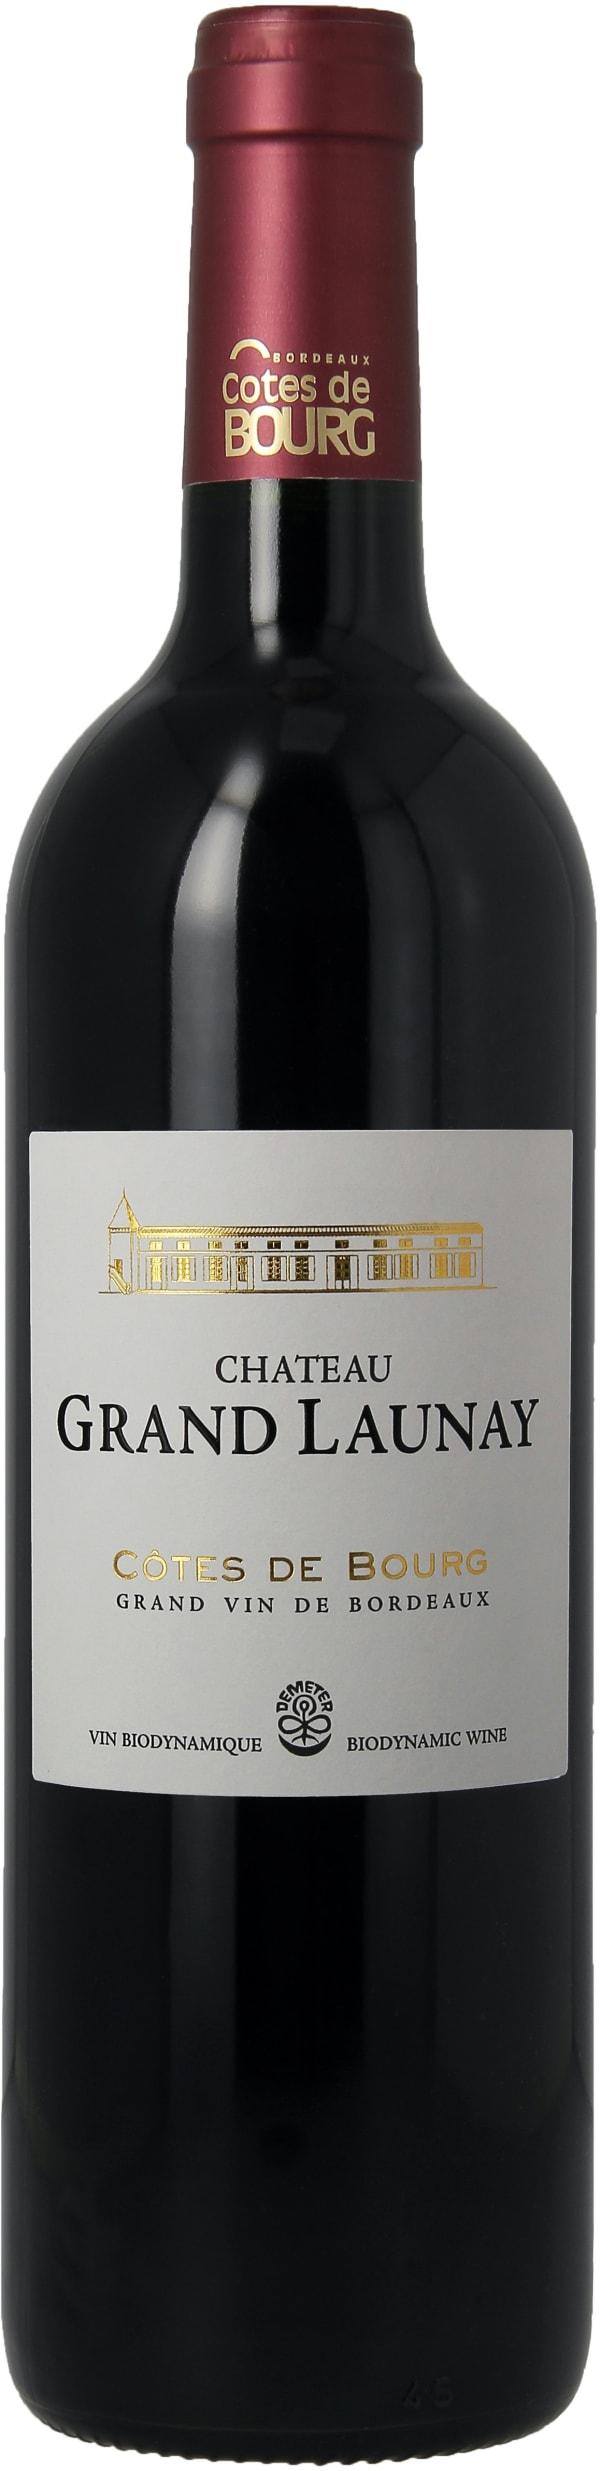 Château Grand Launay 2019